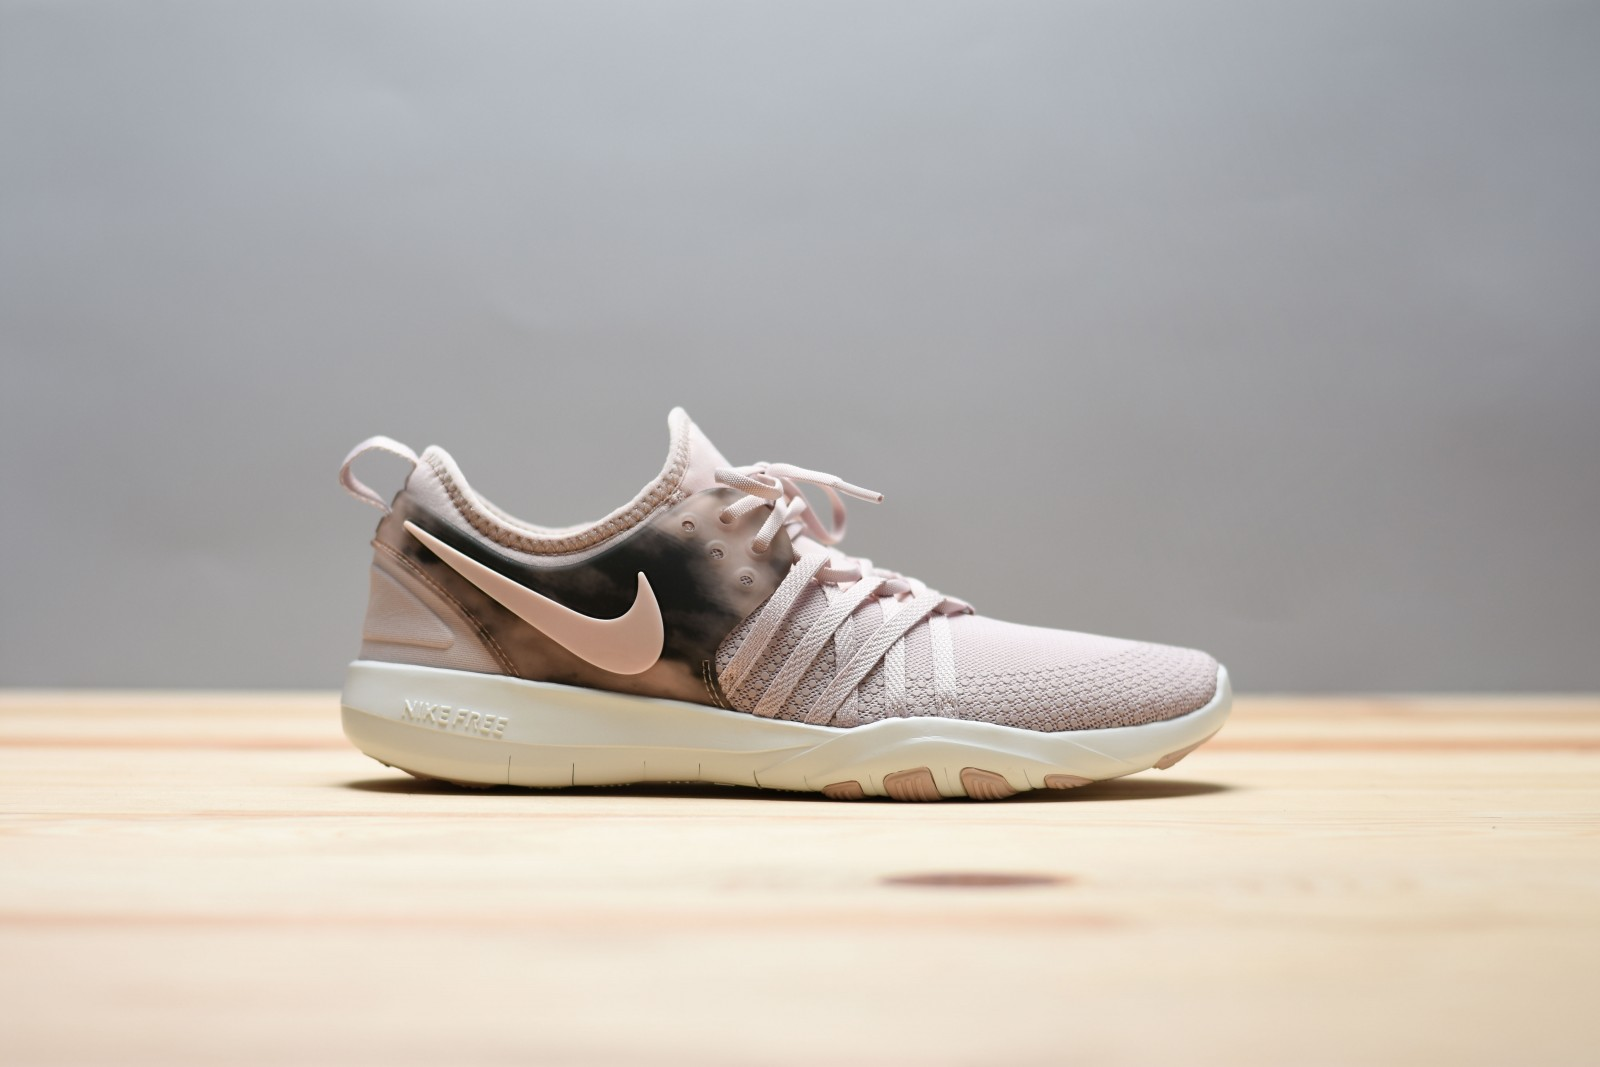 Dámské fitness boty Nike WMNS FREE TR 7 AMP  f71e2825b8